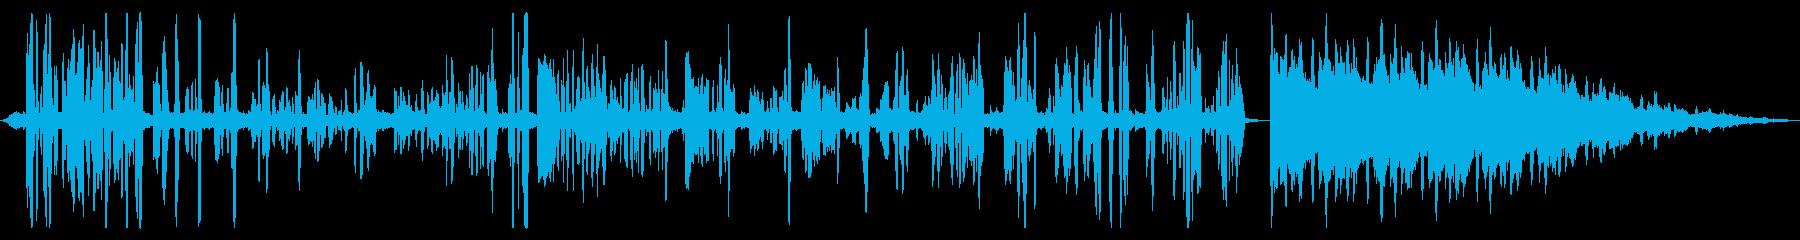 BGM向けミキシング解説動画 vol.1の再生済みの波形